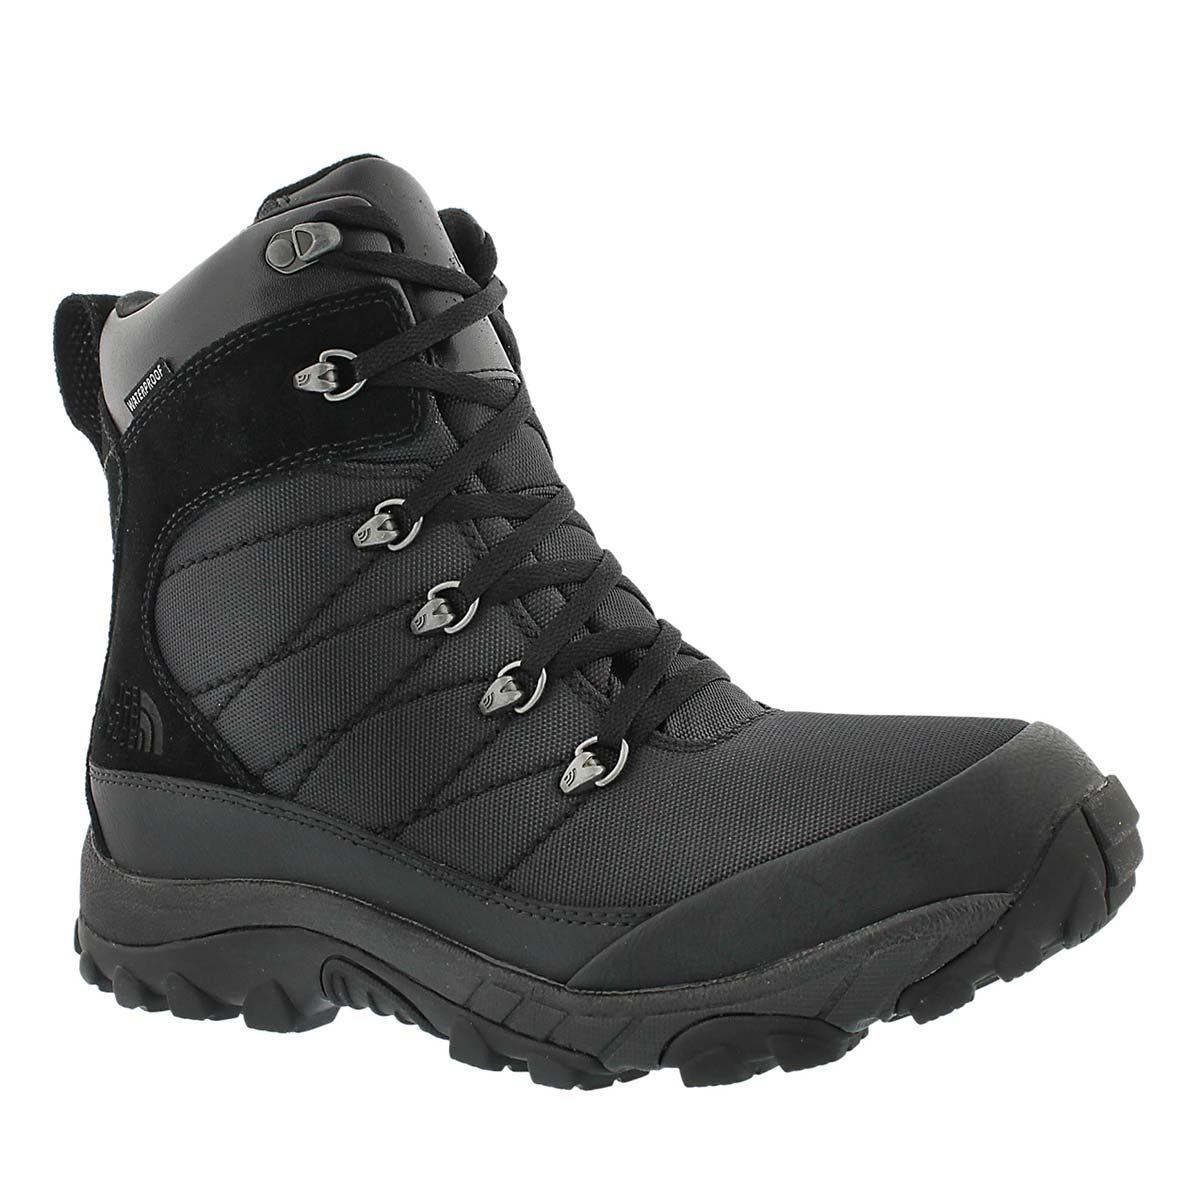 Mns Chilkat Nylon wtpf blk winter boot